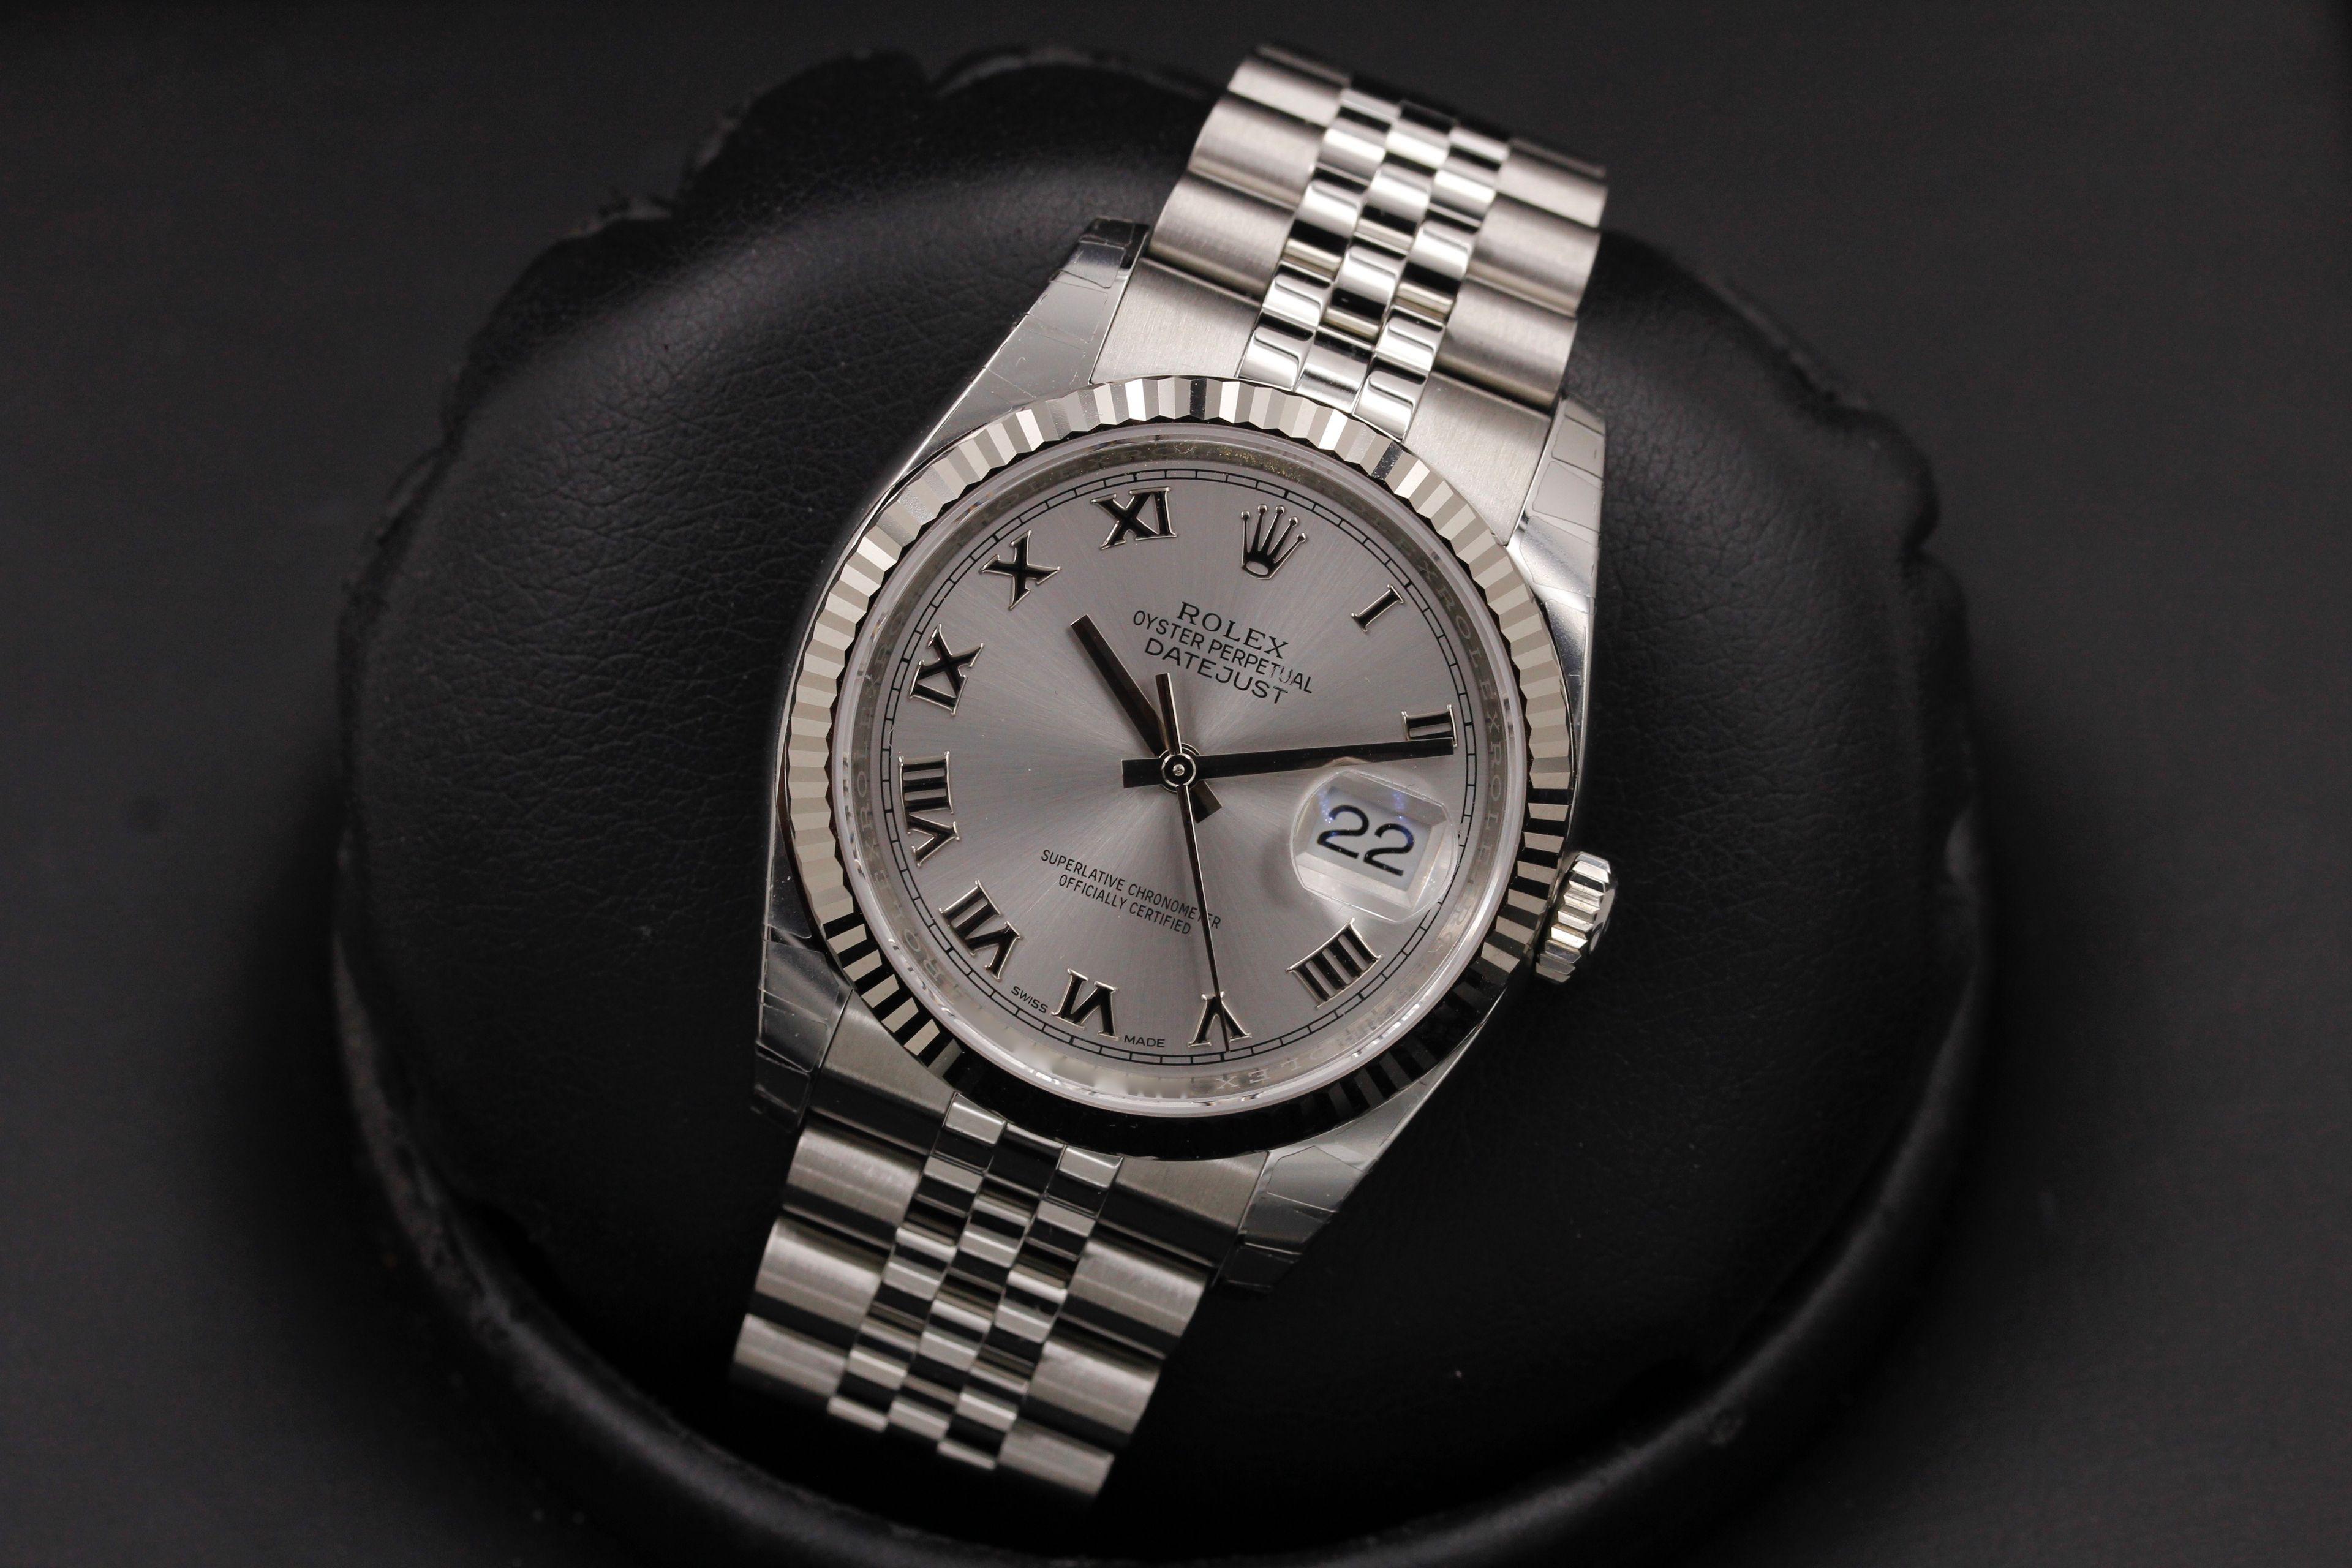 9a5d3af8943 Rolex Datejust - 116234 - Rhod Roman Dial - Jubilee - 2018 - NEW IN BOX ( Rolex)